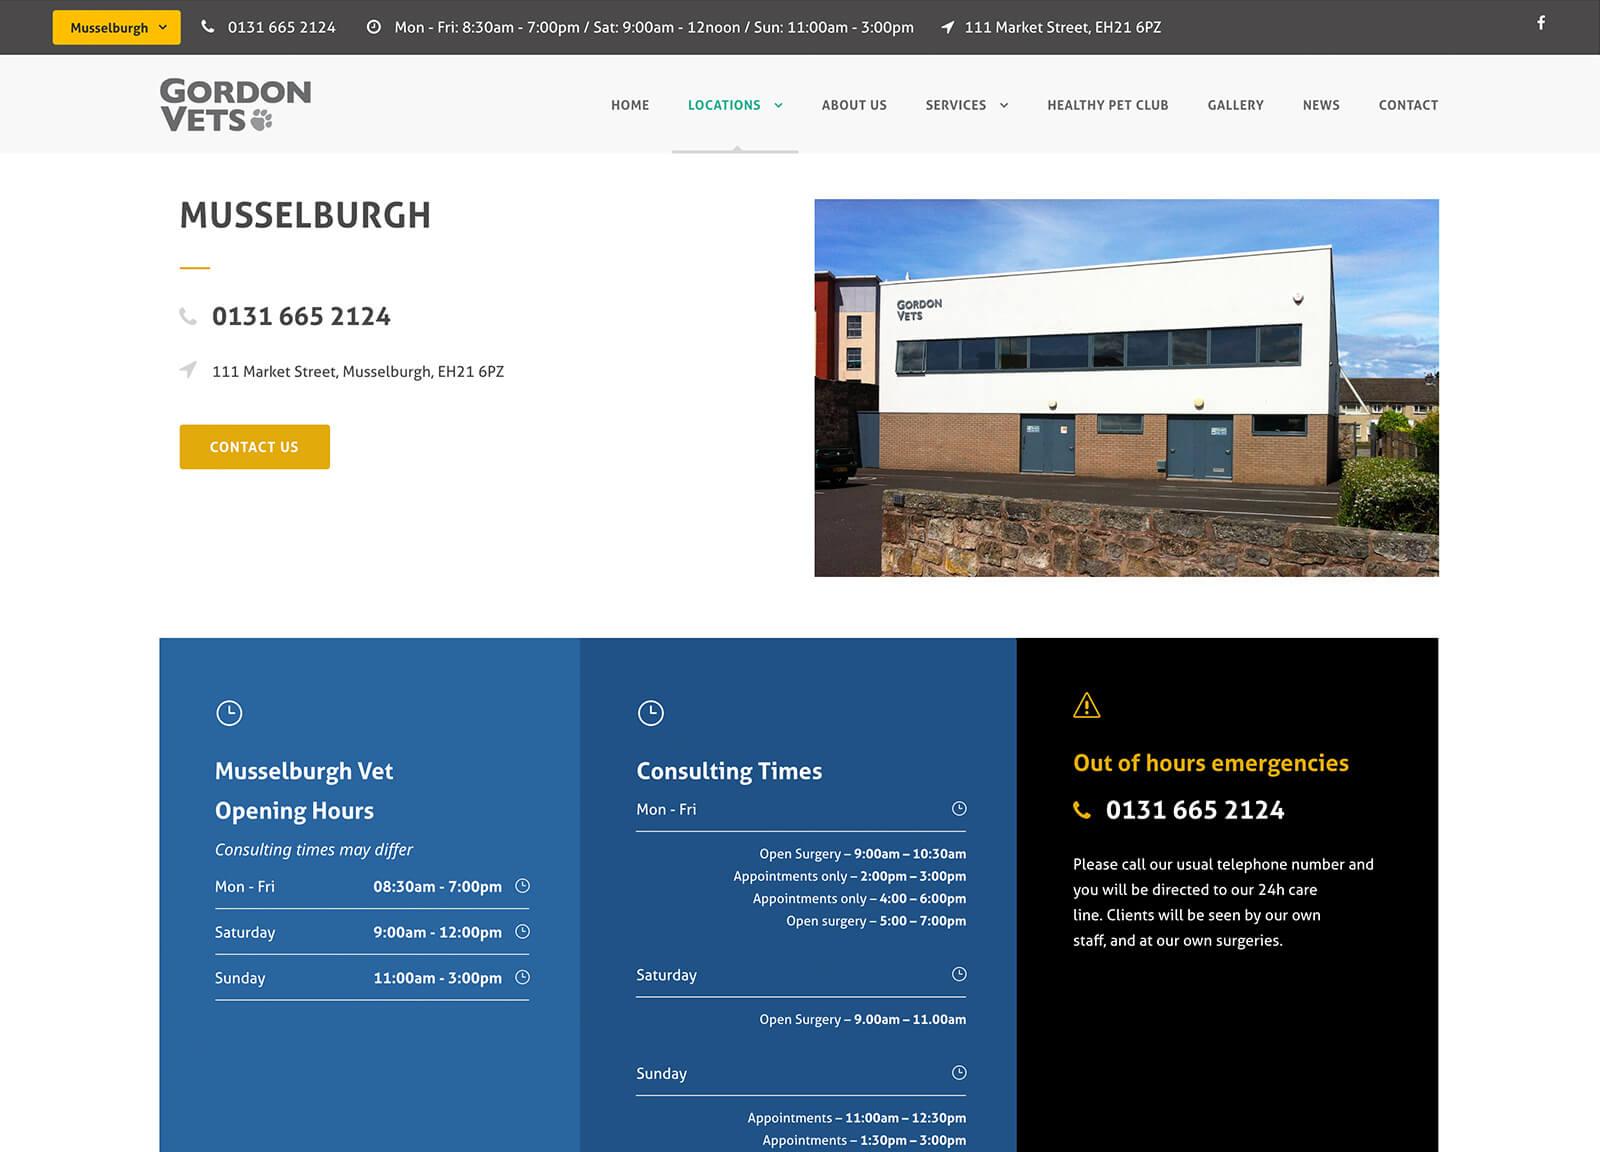 Musselburgh vet practice page - Gordon Vets website design